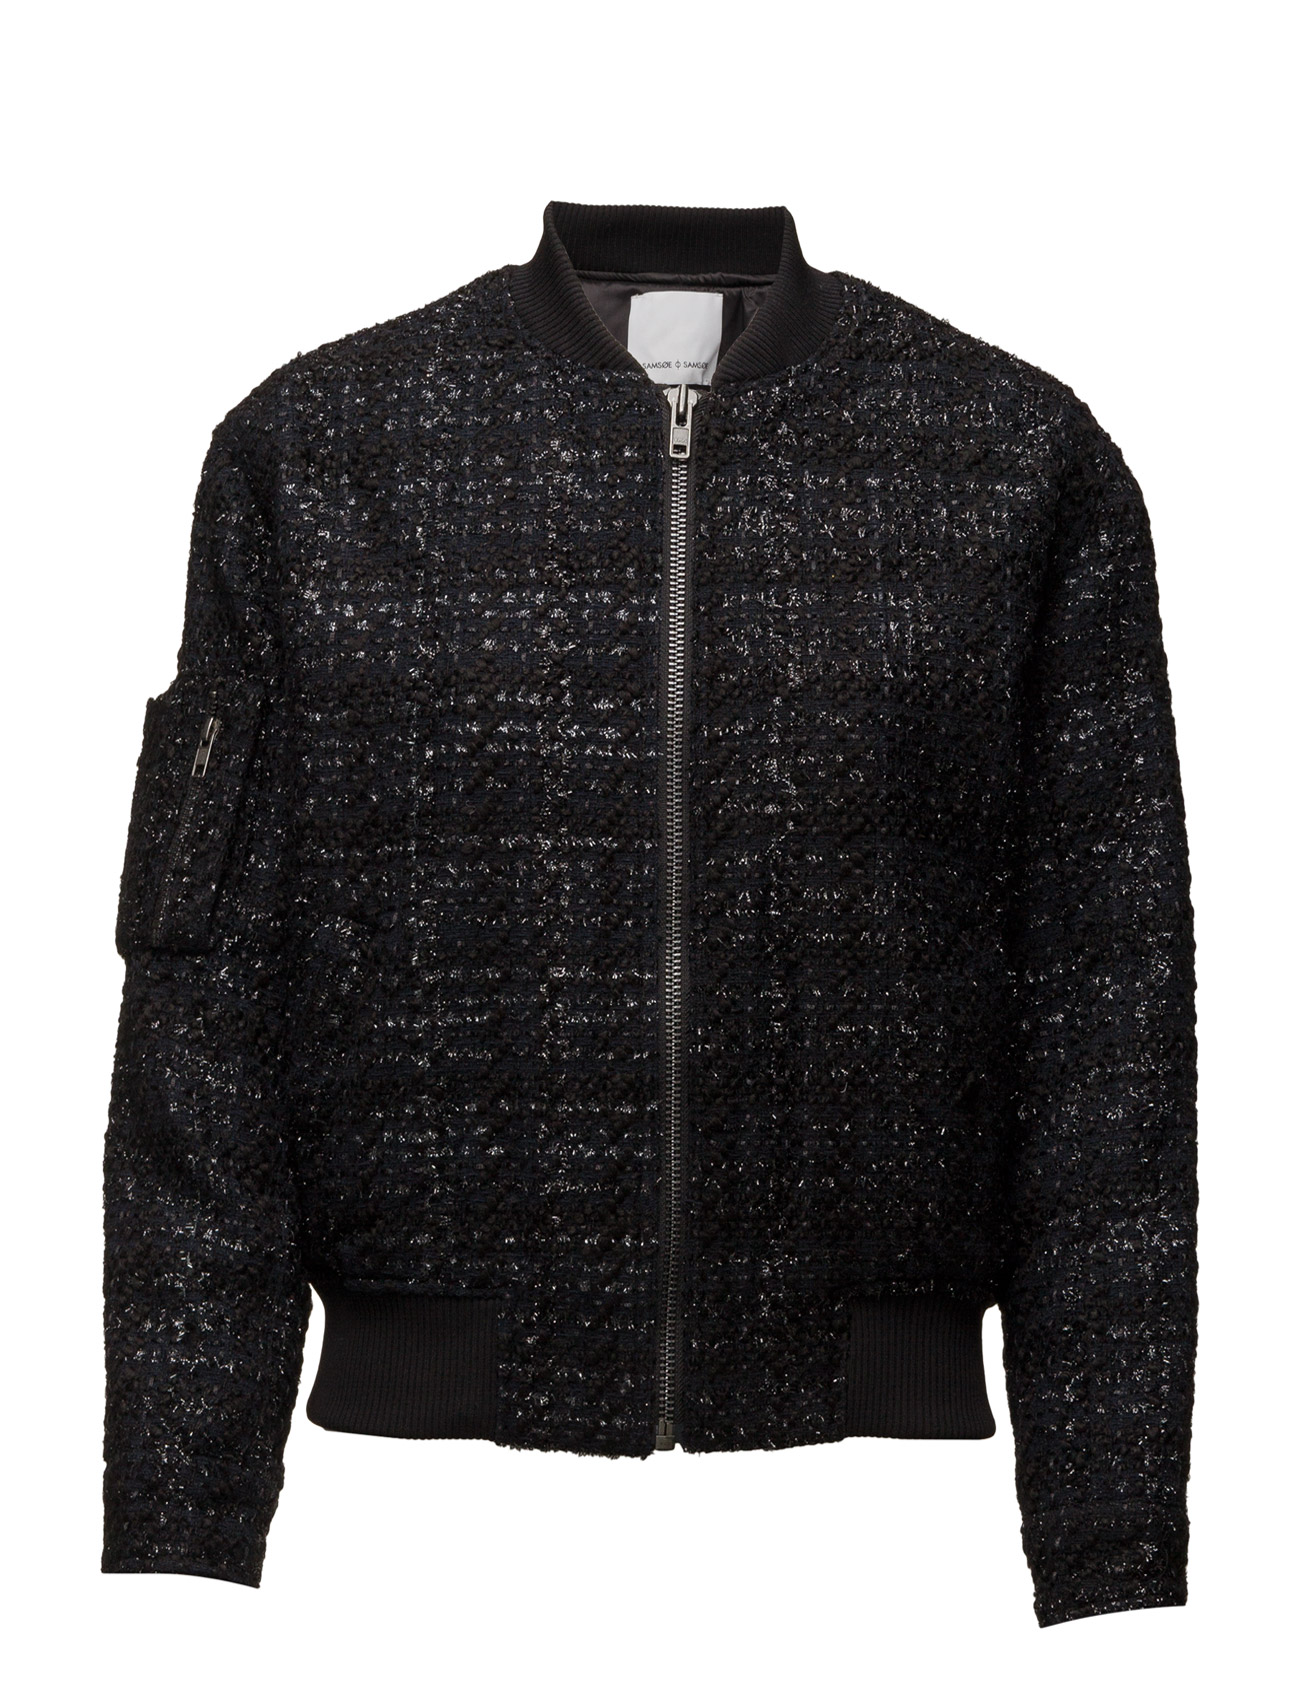 Samsøe & Samsøe Tori jacket 7413